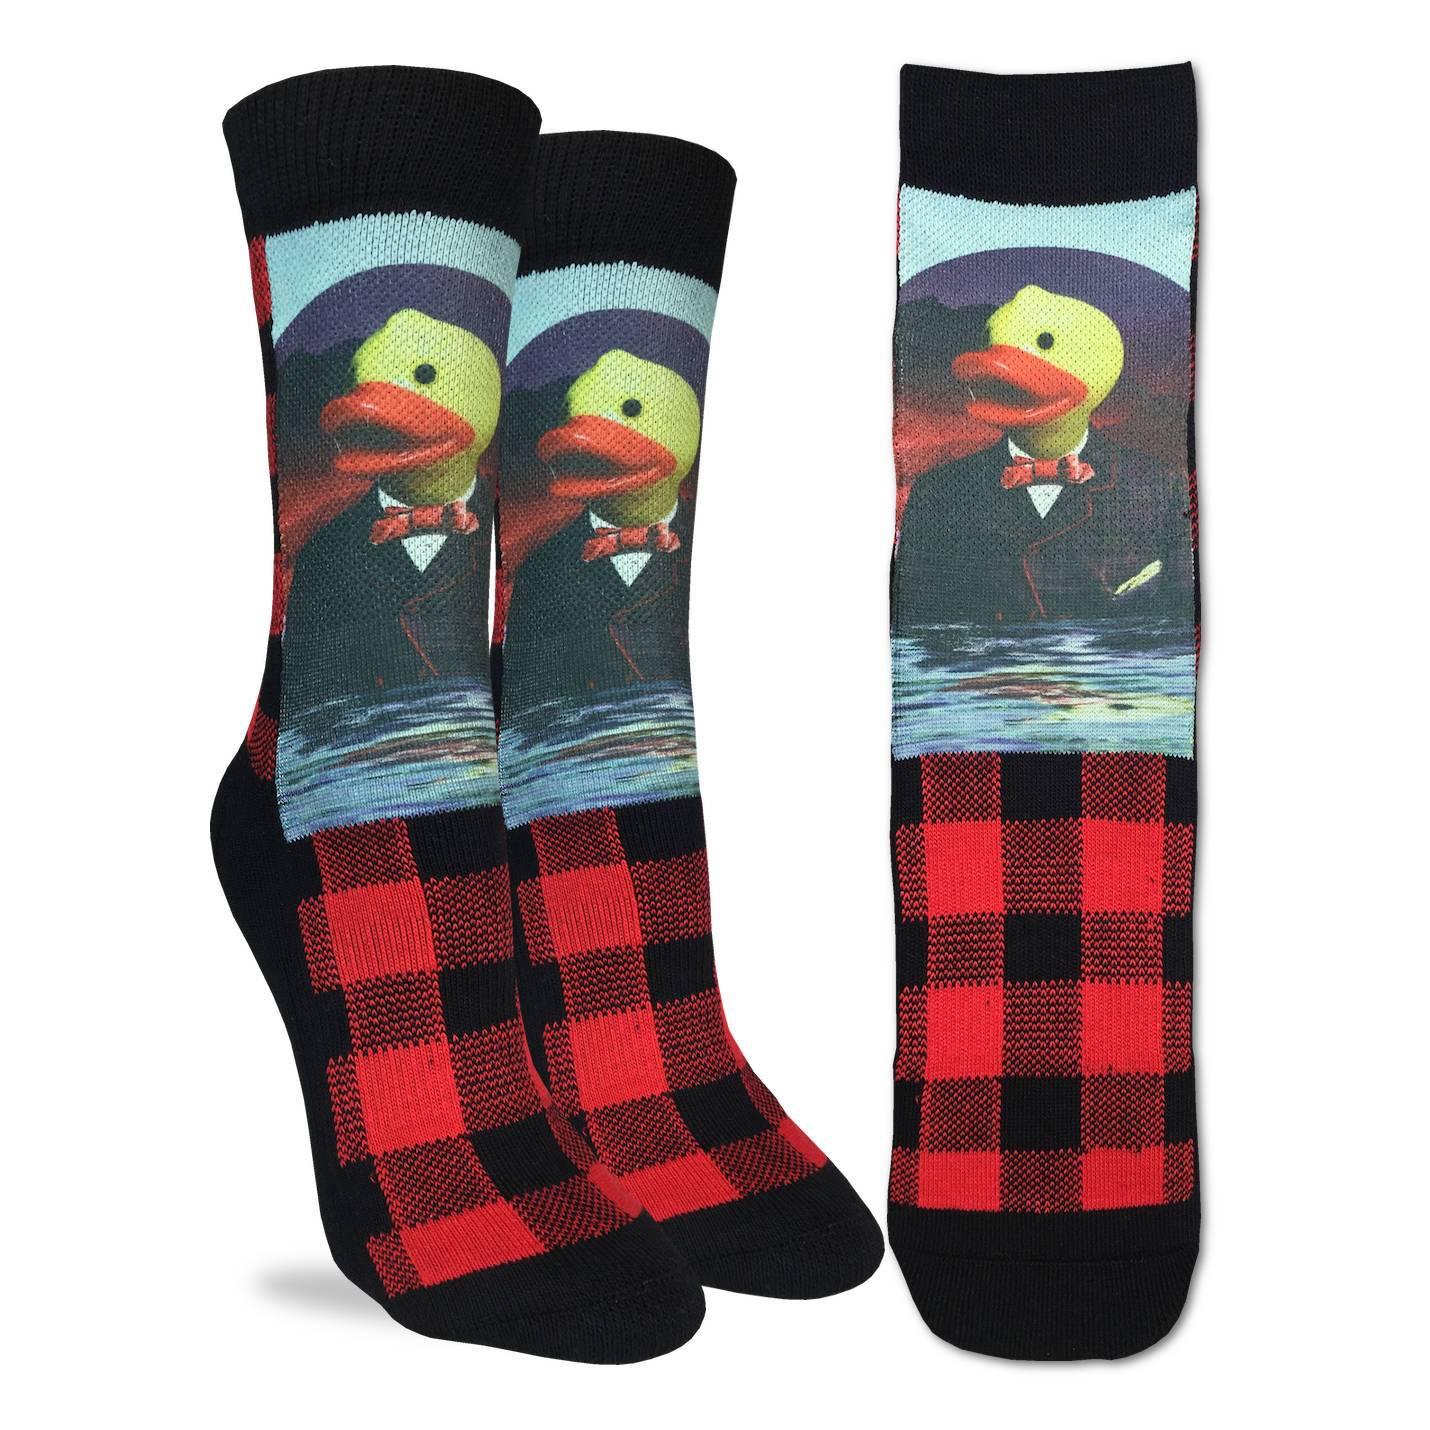 Green Adult Shoe Size 5-9 Good Luck Sock Womens Troll Dolls Socks